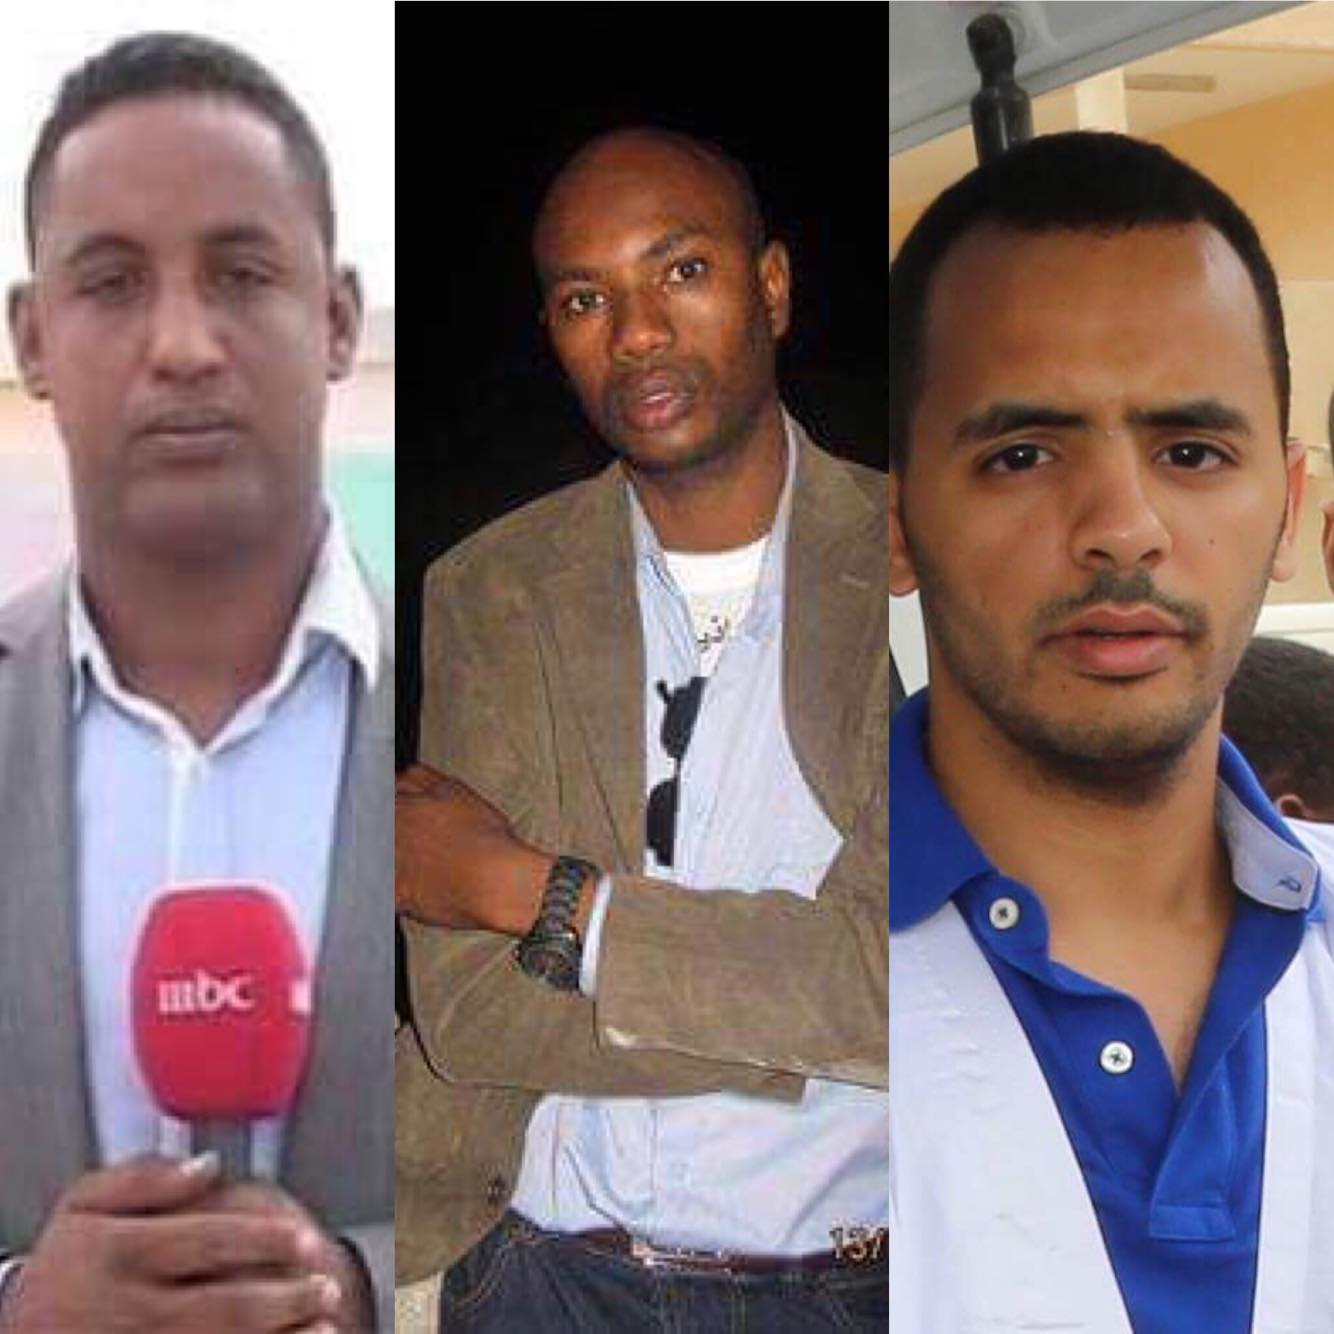 Mauritanie - Journalisme : Appel à candidature au Prix Cheikh O. Ndiaye 2019